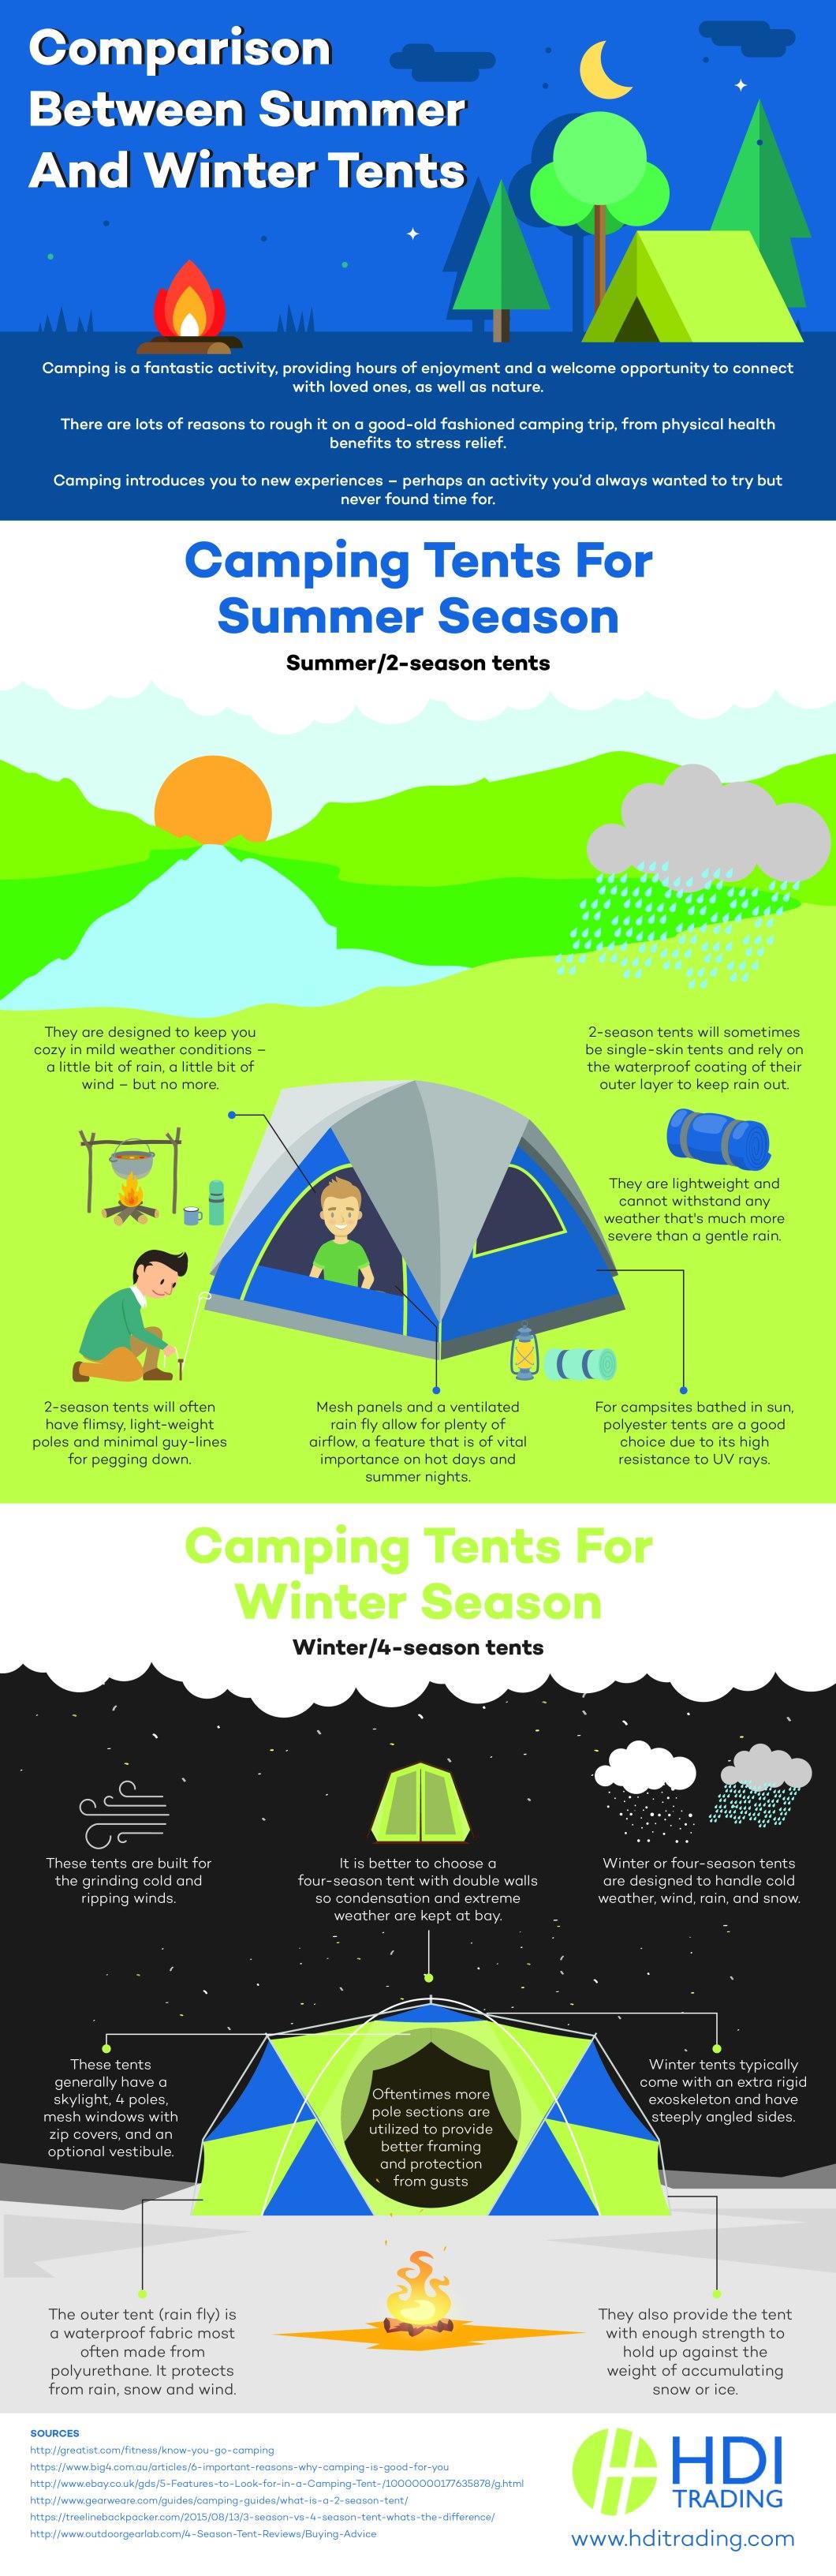 Summer Tents vs Winter Tents - Infographic